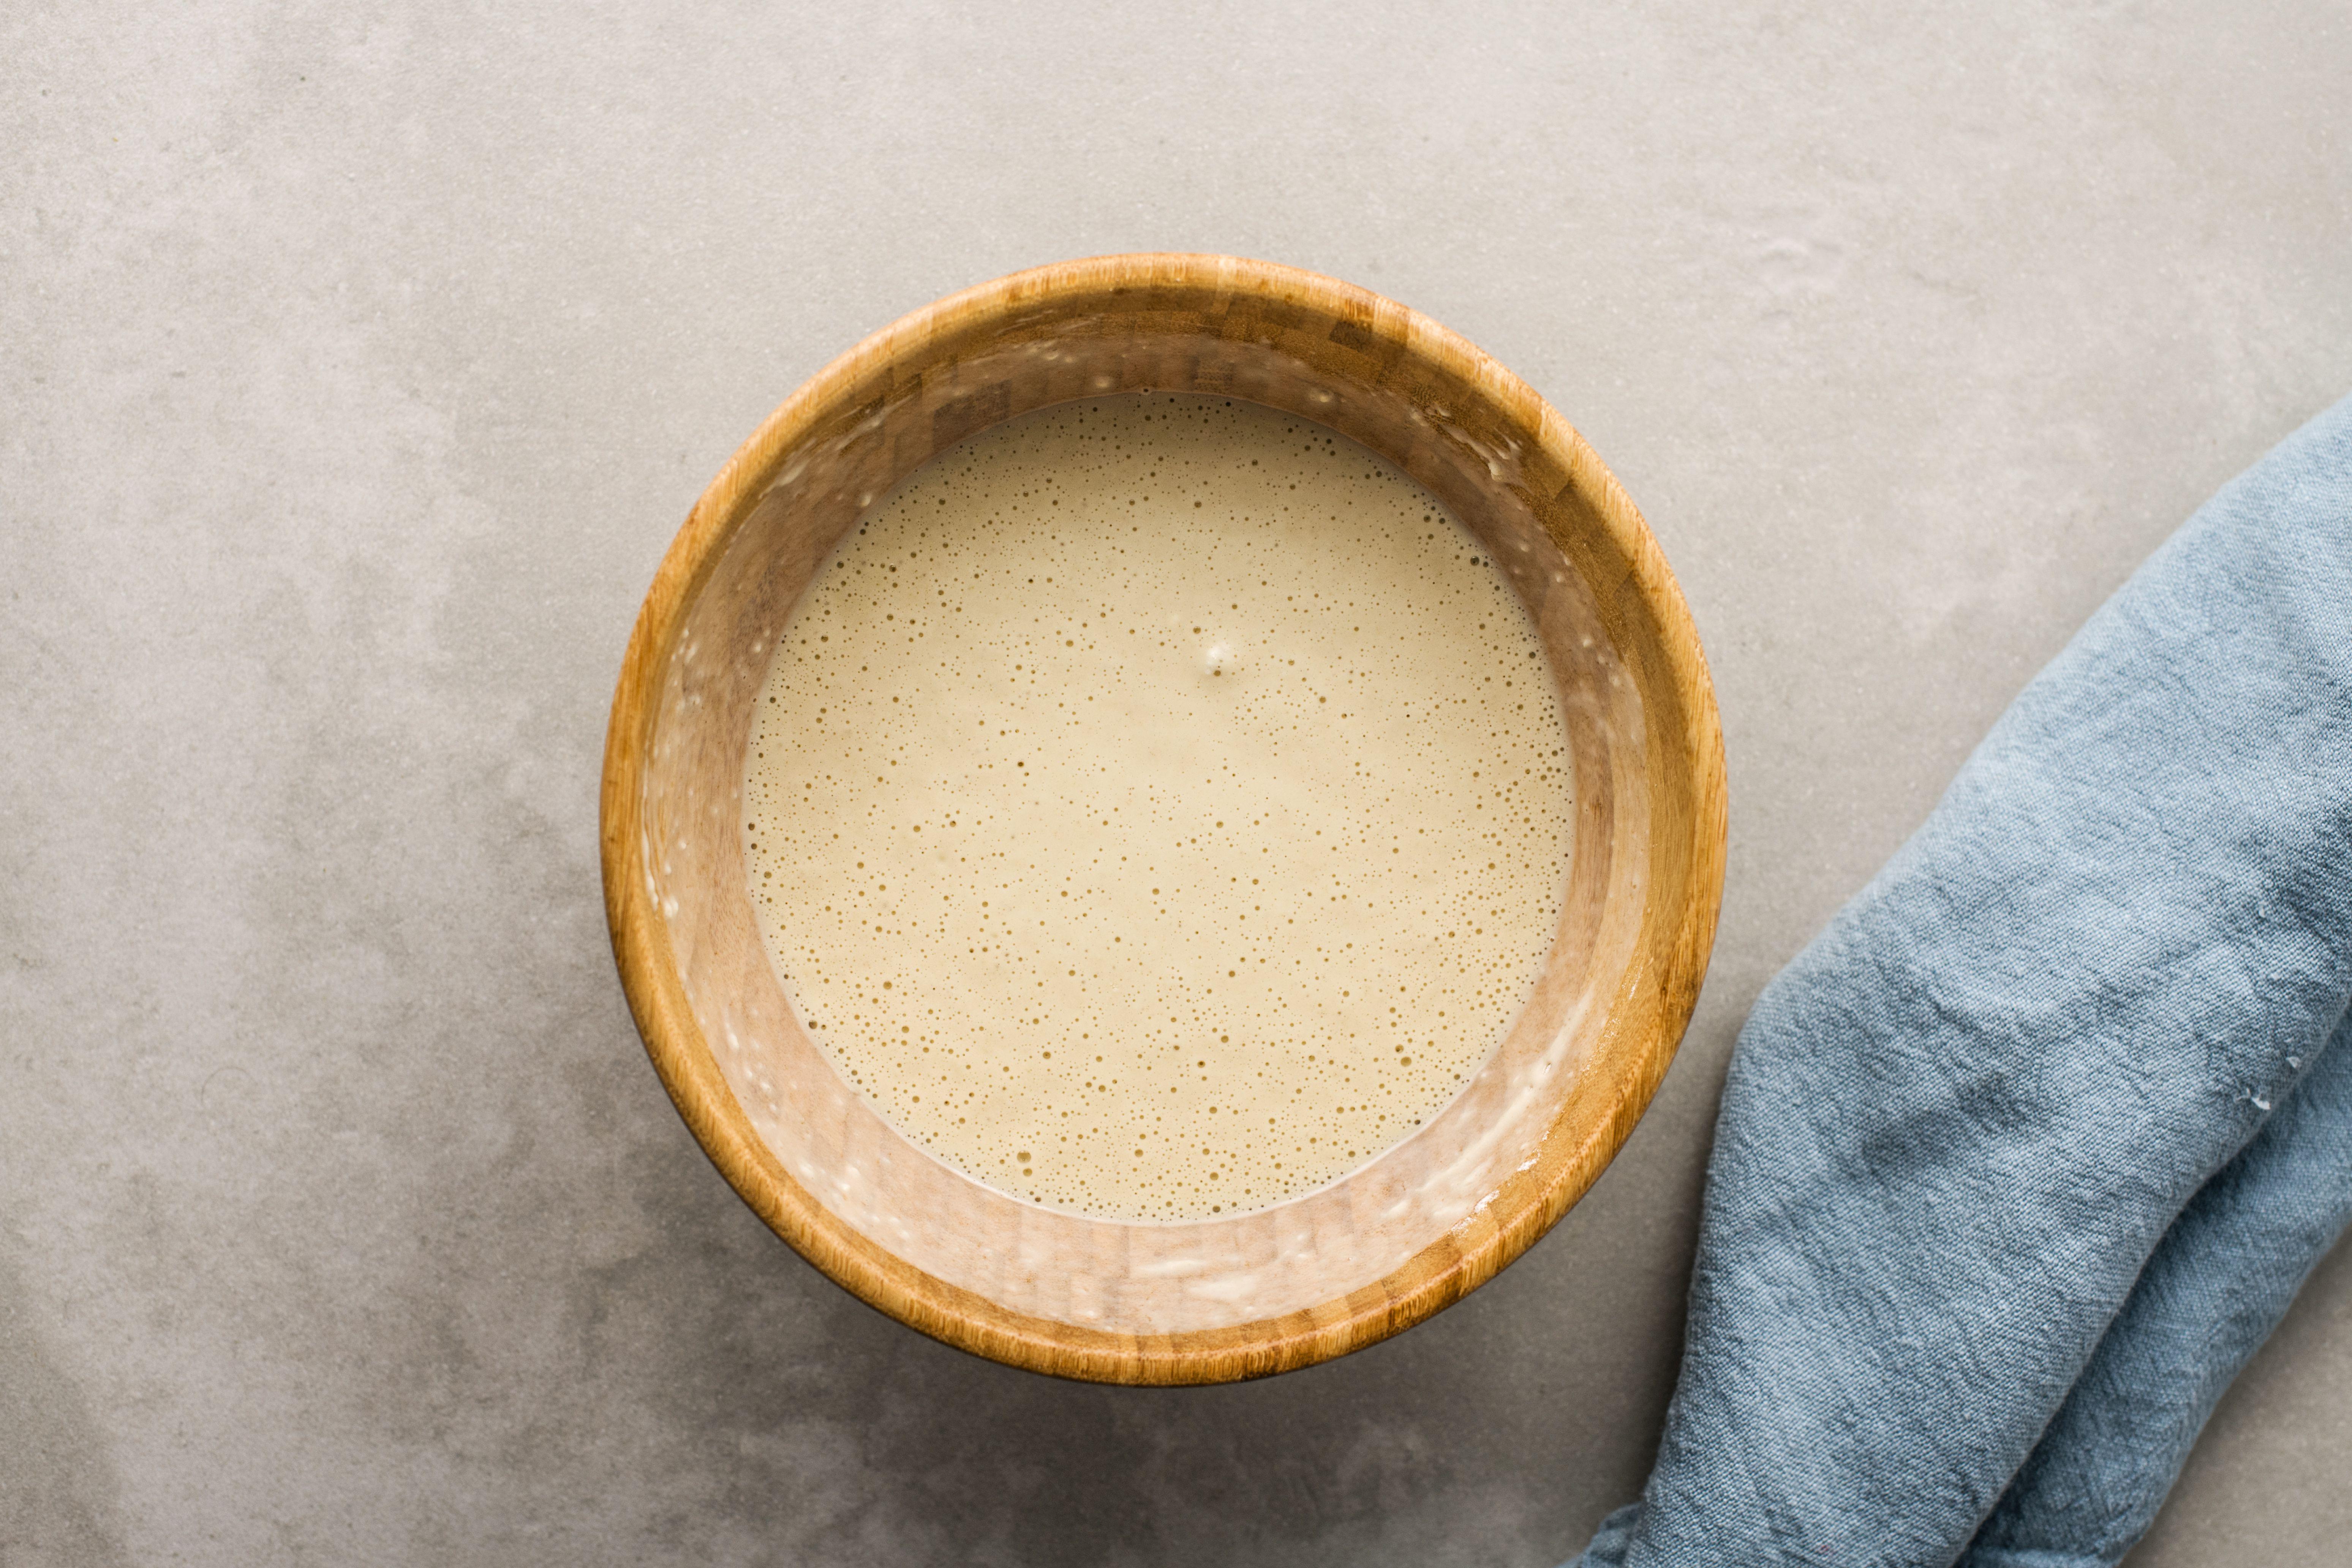 Mix in flour